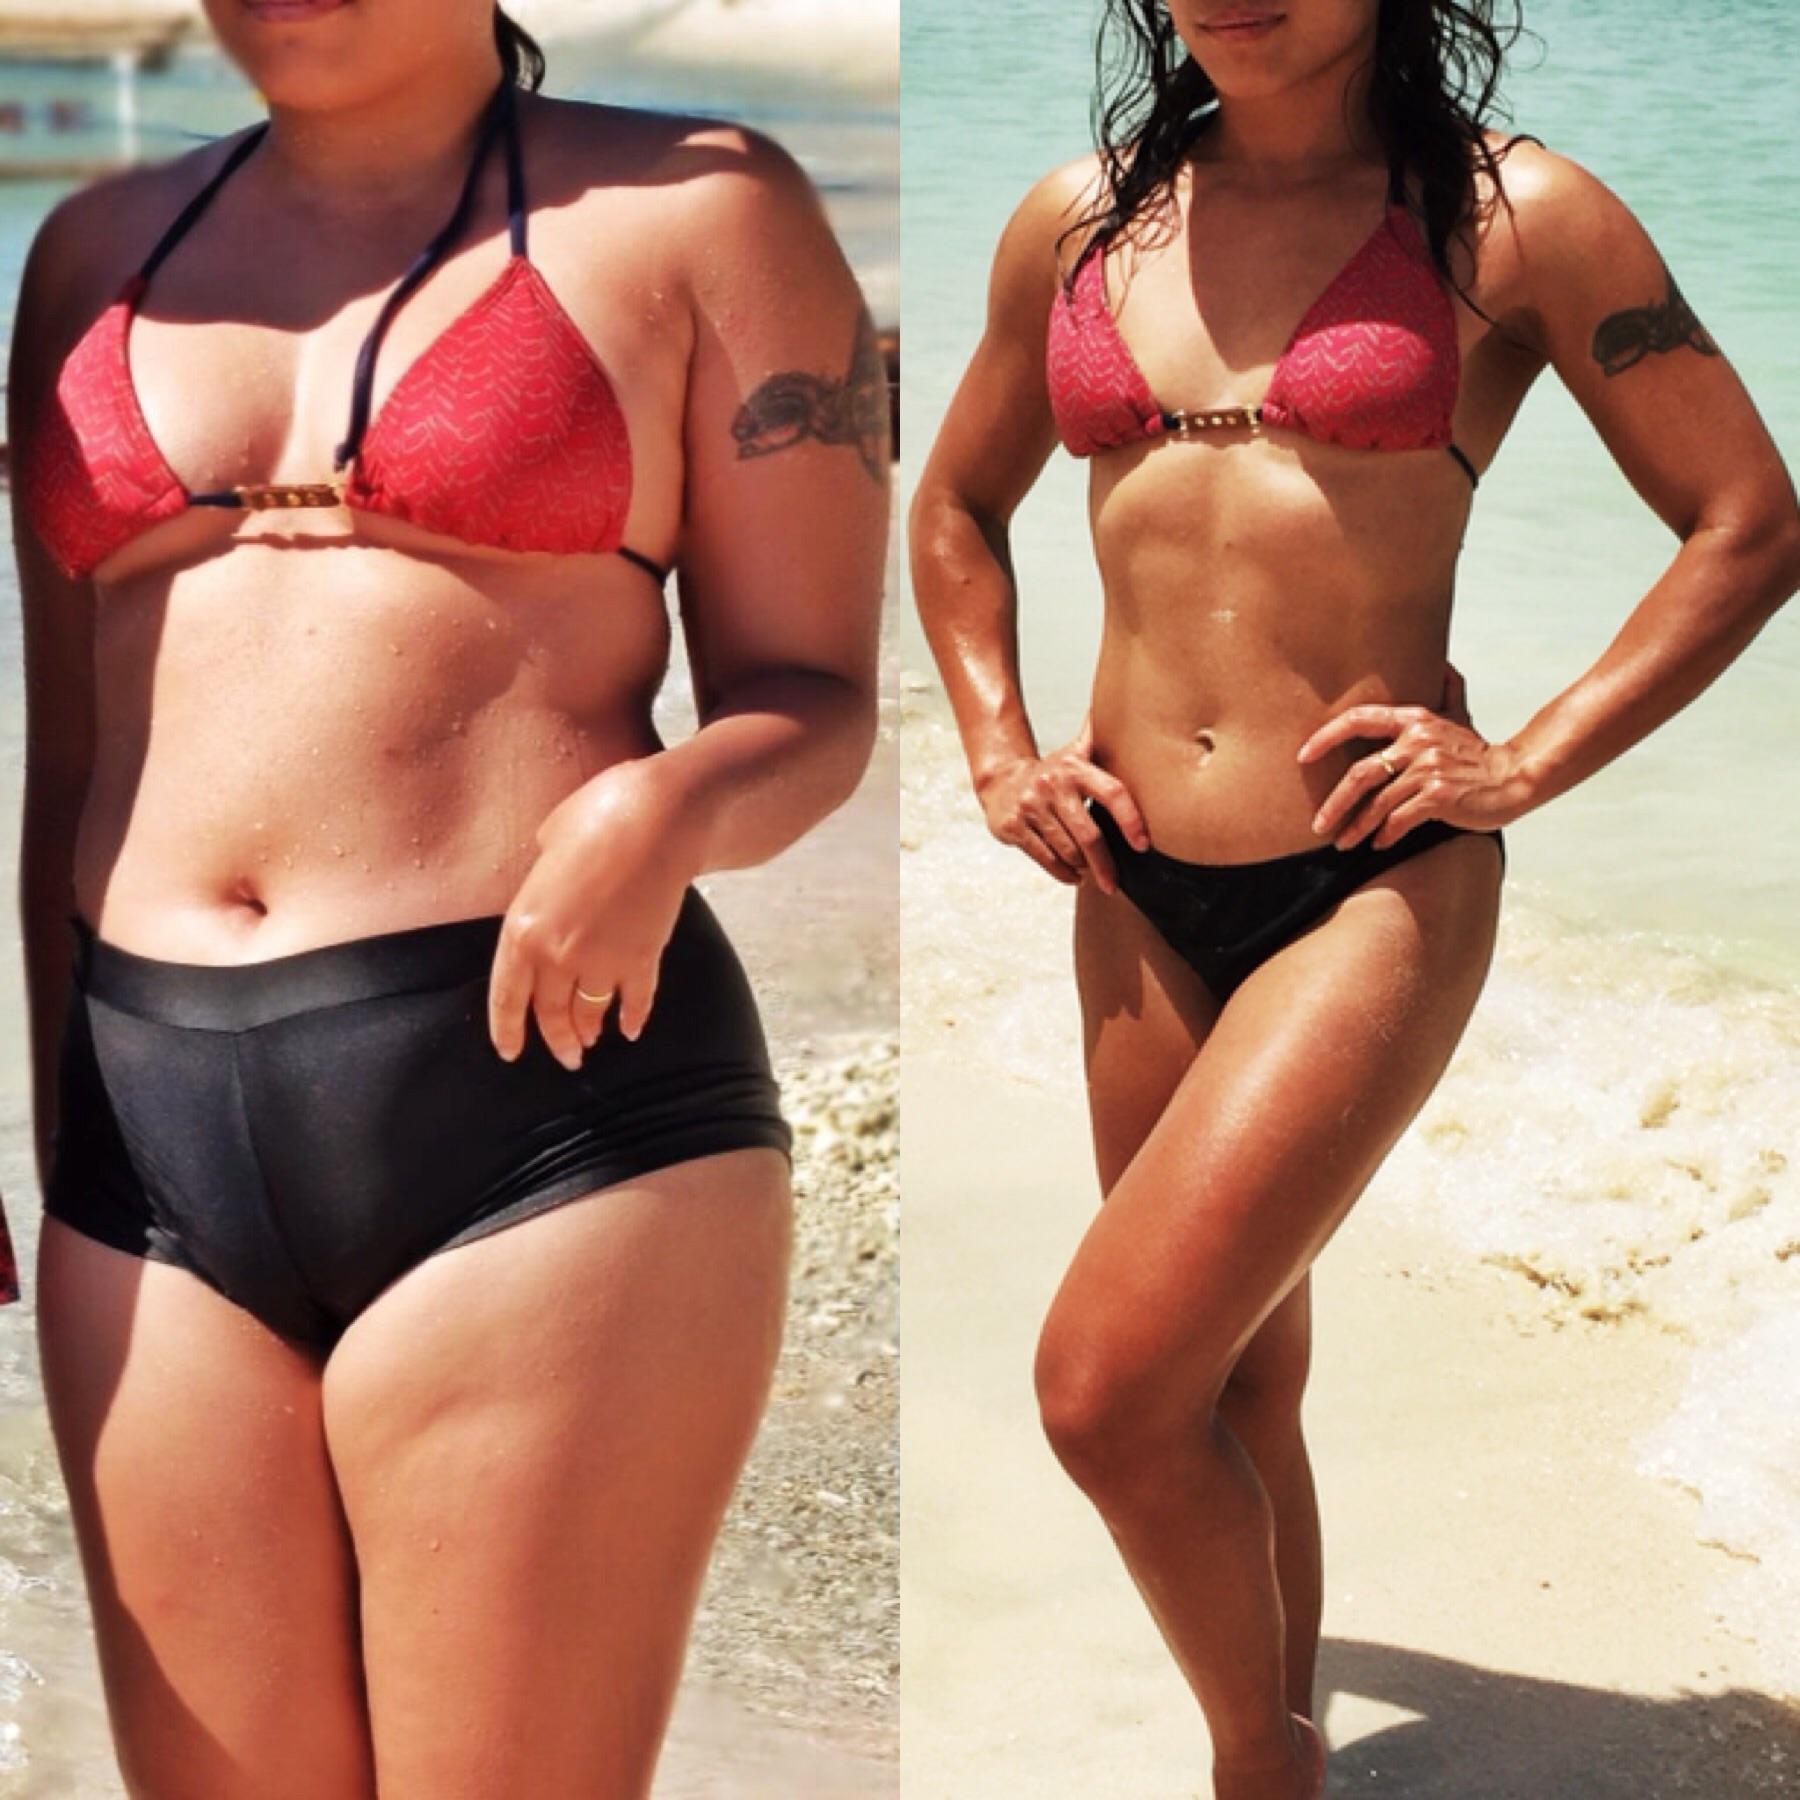 Девушка После Похудения Фото. Похудевшие девушки - 50 фото